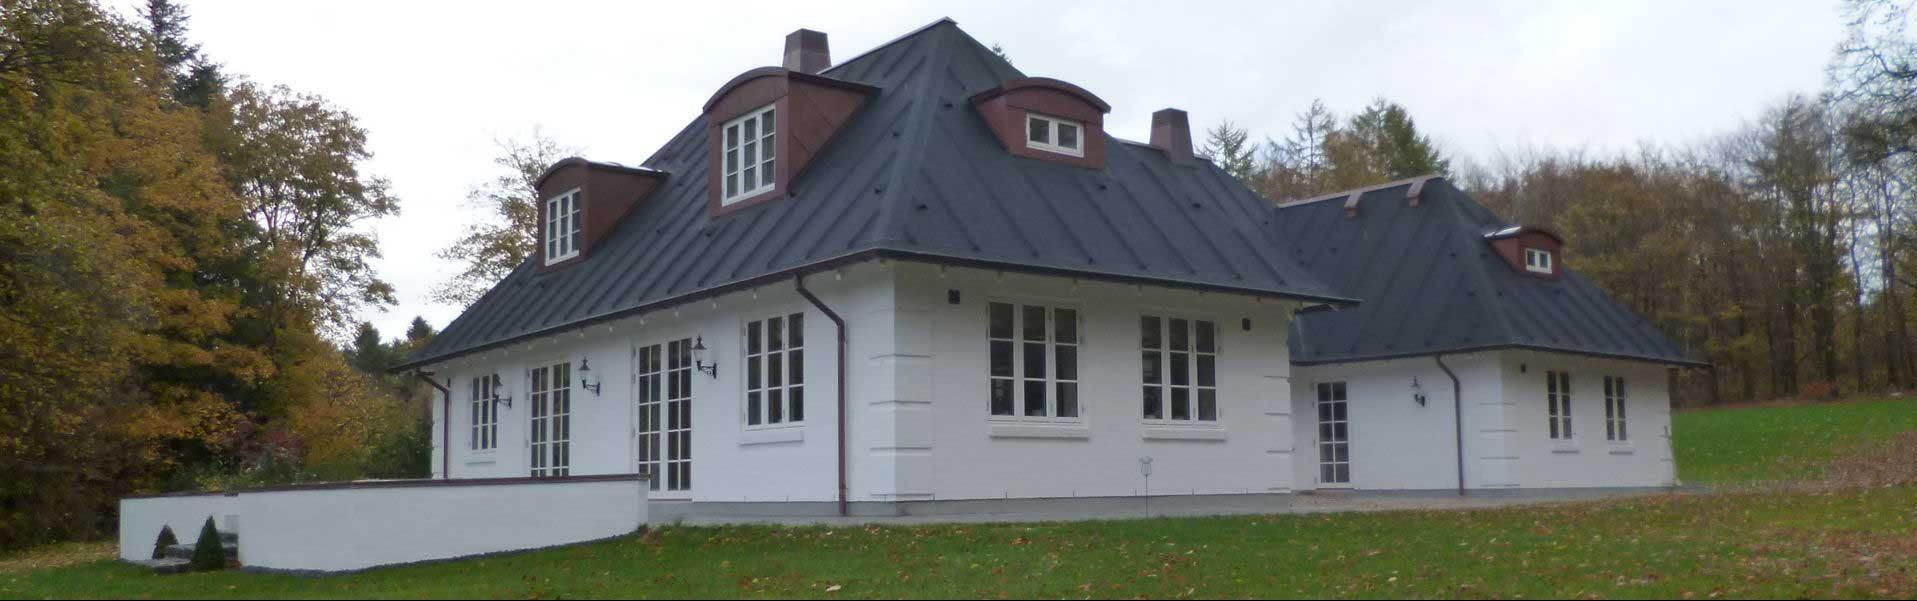 Arkitekthuset Vodskov A/S Slider 3